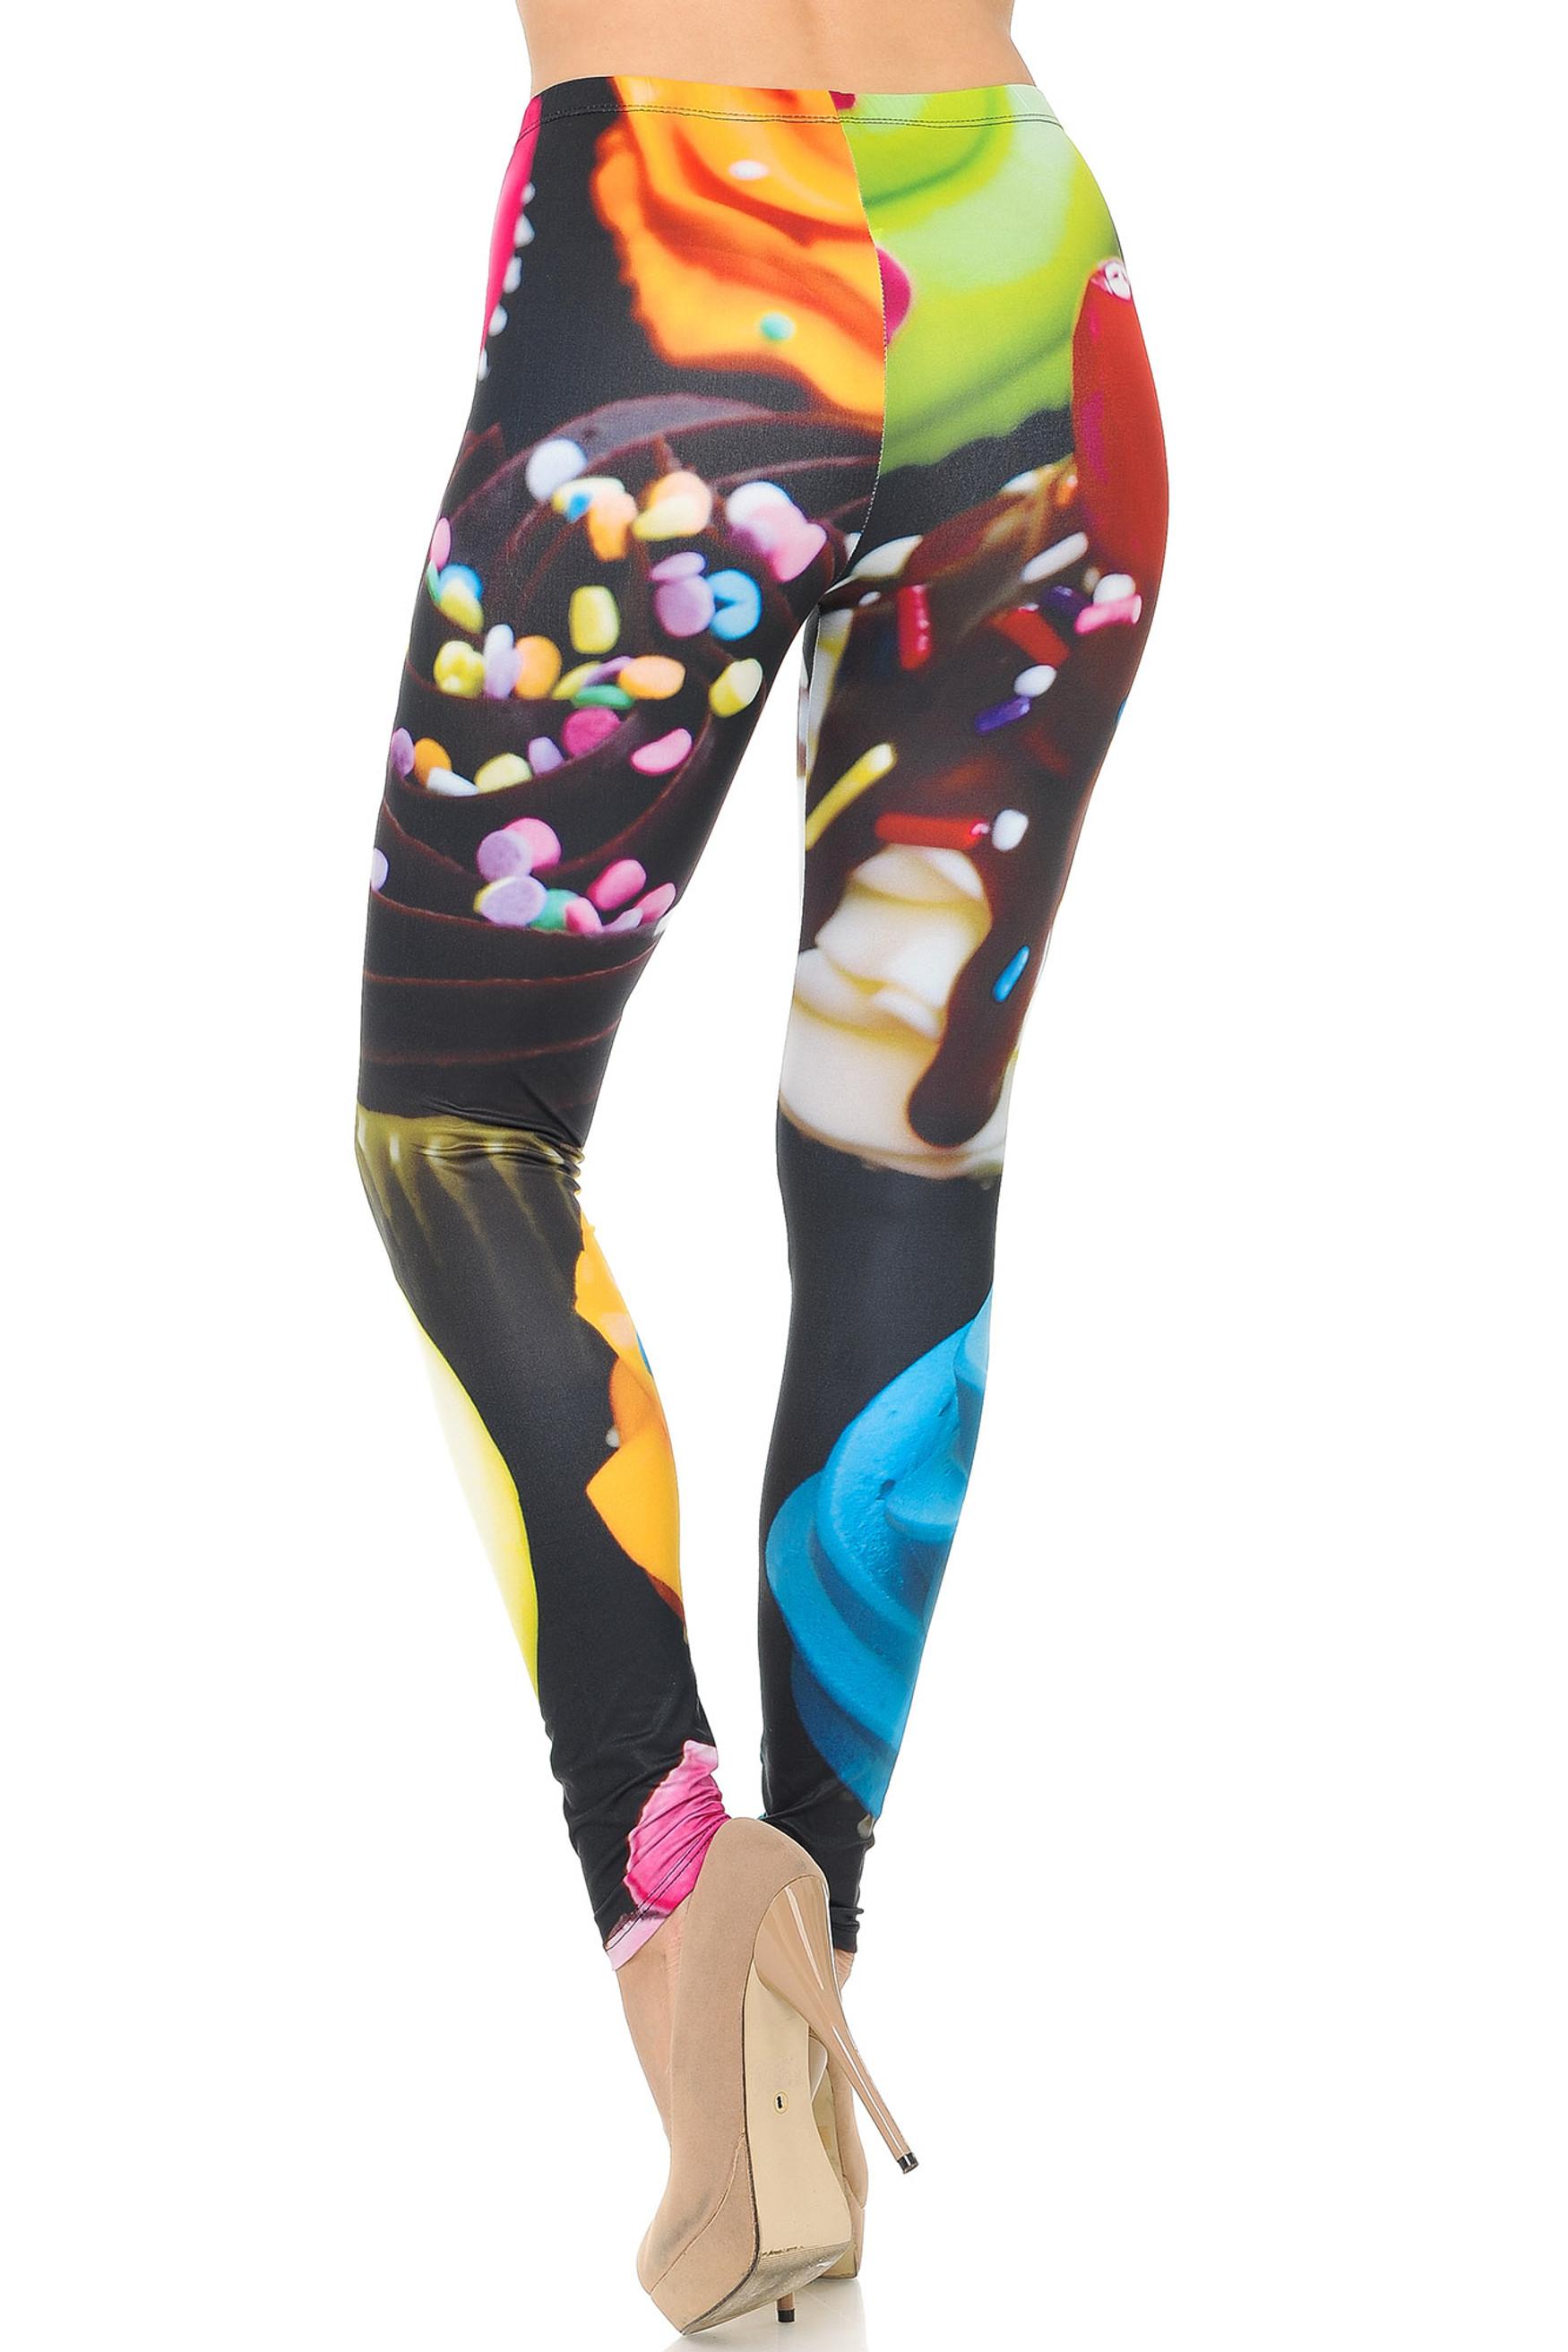 Back side image of Double Soft Brushed Colorful Cupcake Leggings